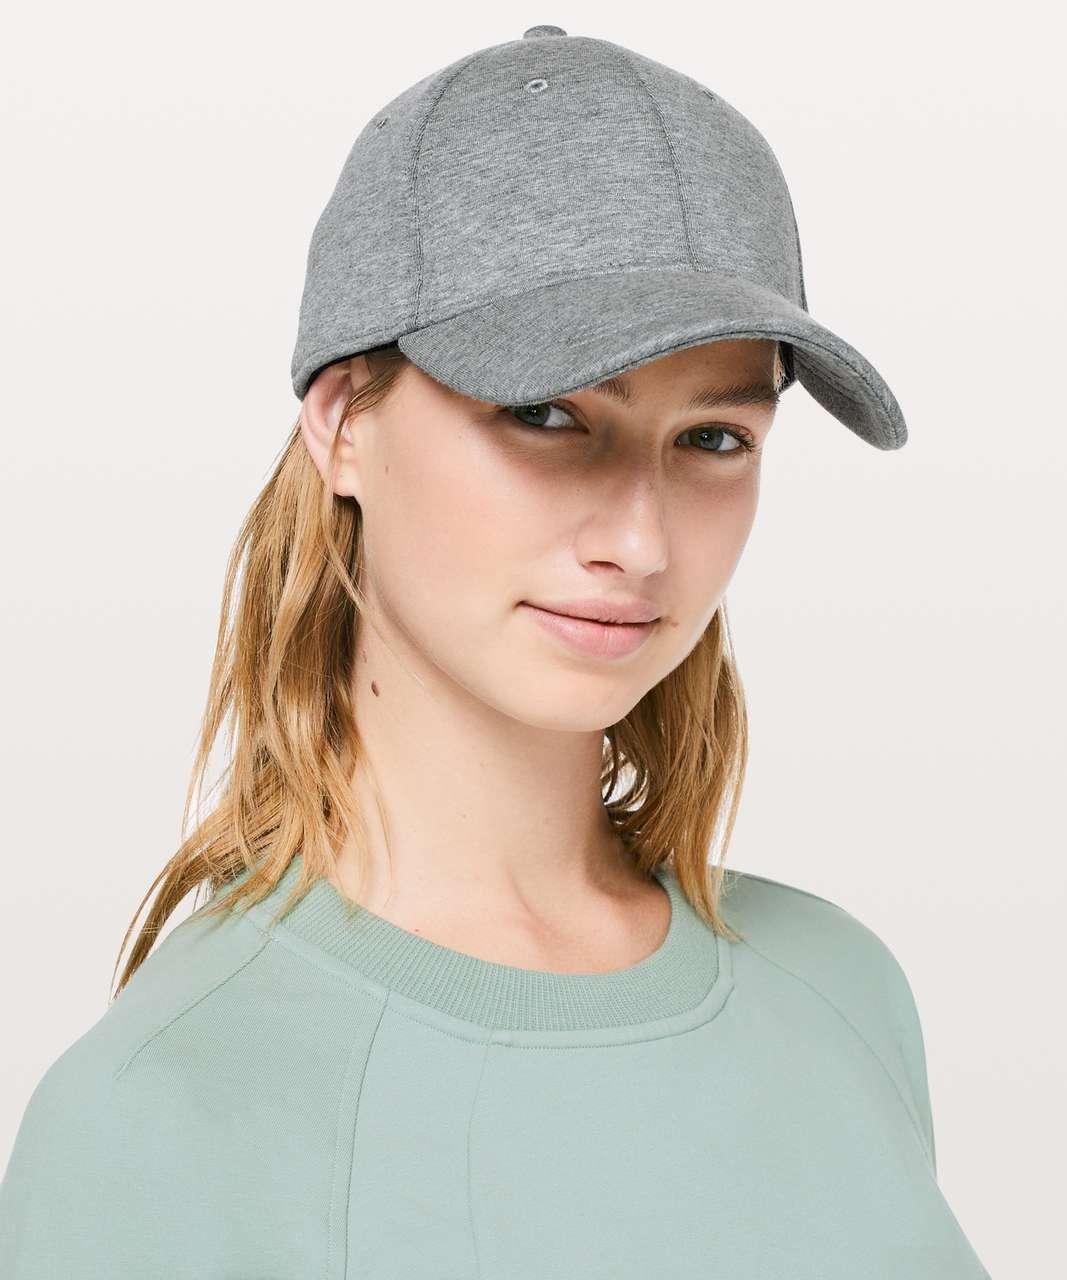 5016e6f48fc01 Lululemon Baller Hat - Heathered Medium Grey   Black - lulu fanatics